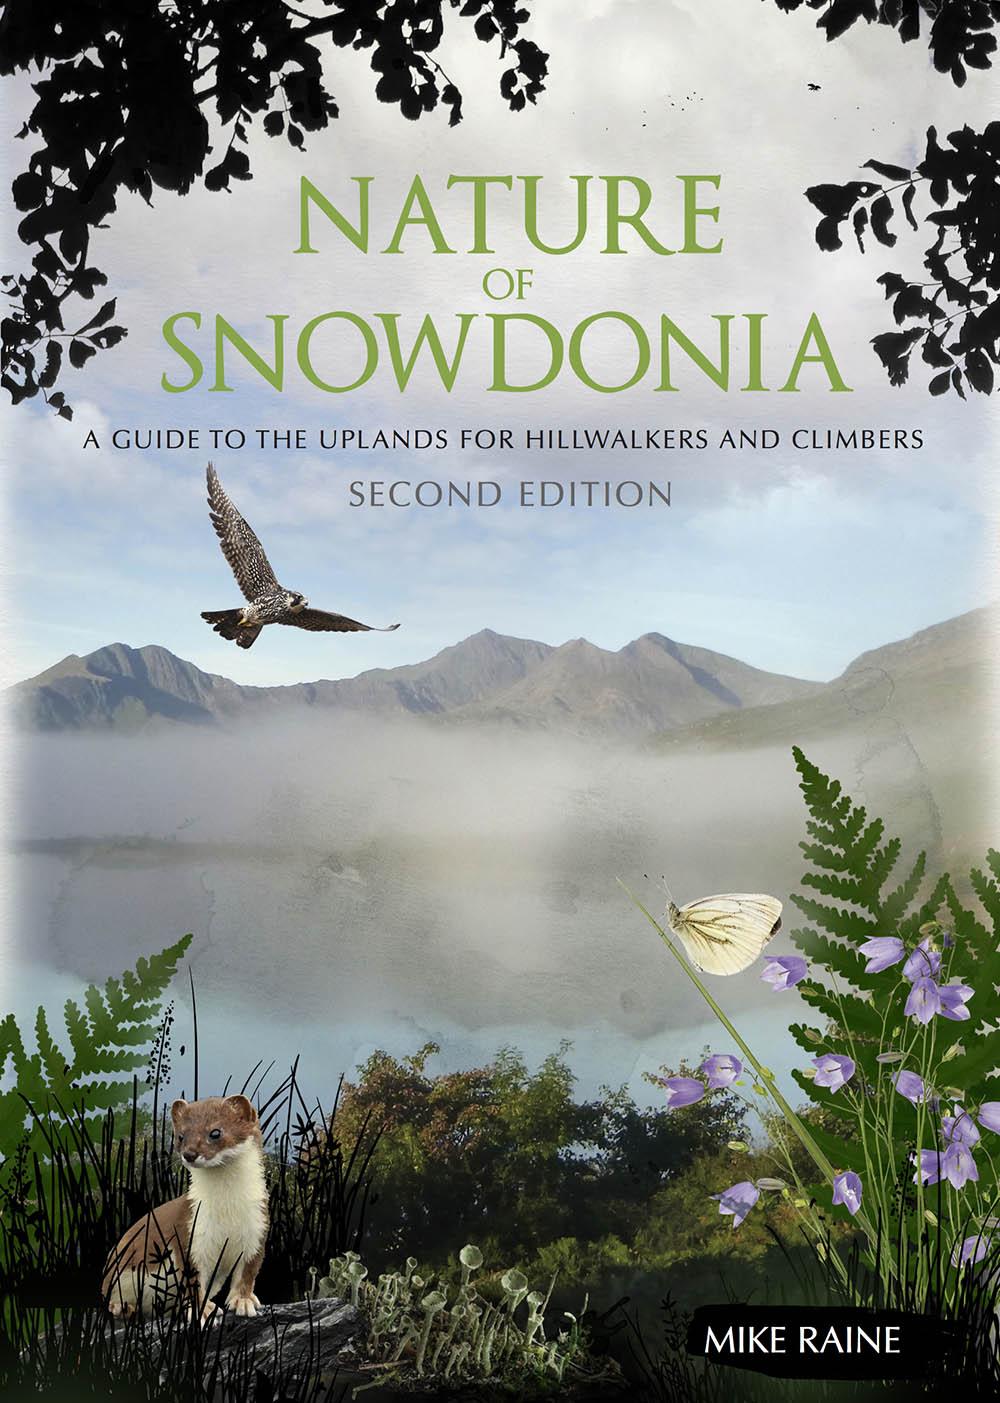 The Nature of Snowdonia